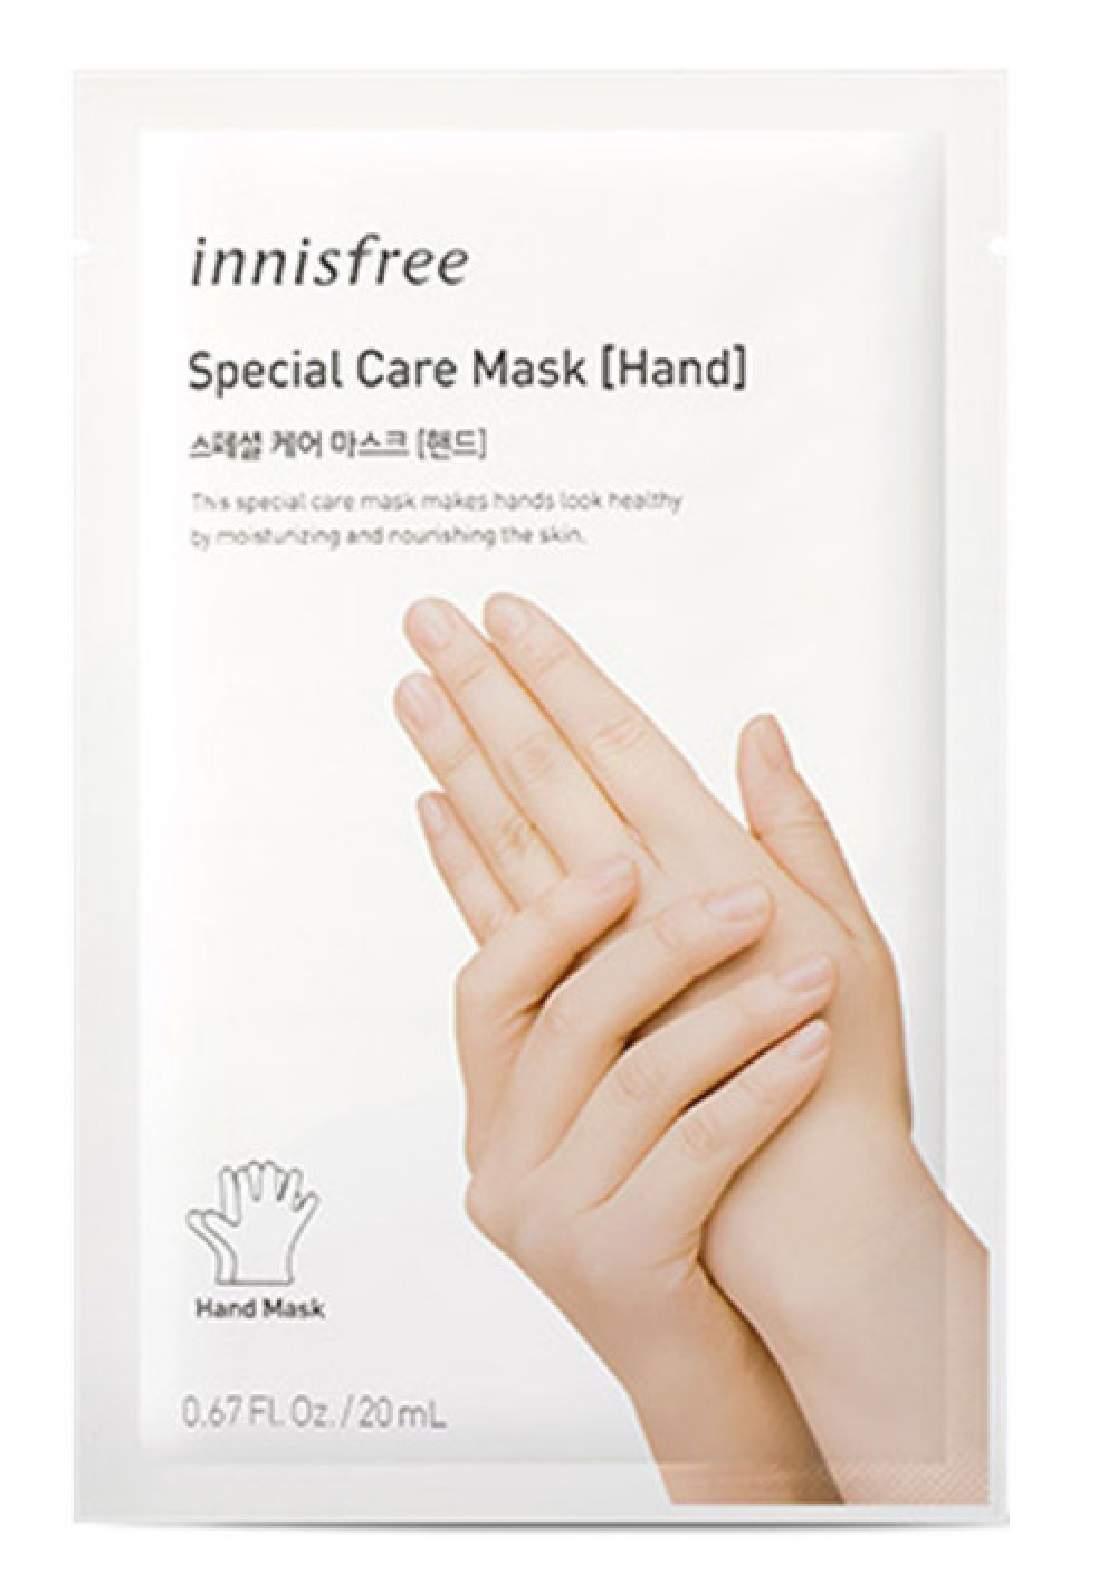 Hand Mask by Innisfree ماسك لليدين